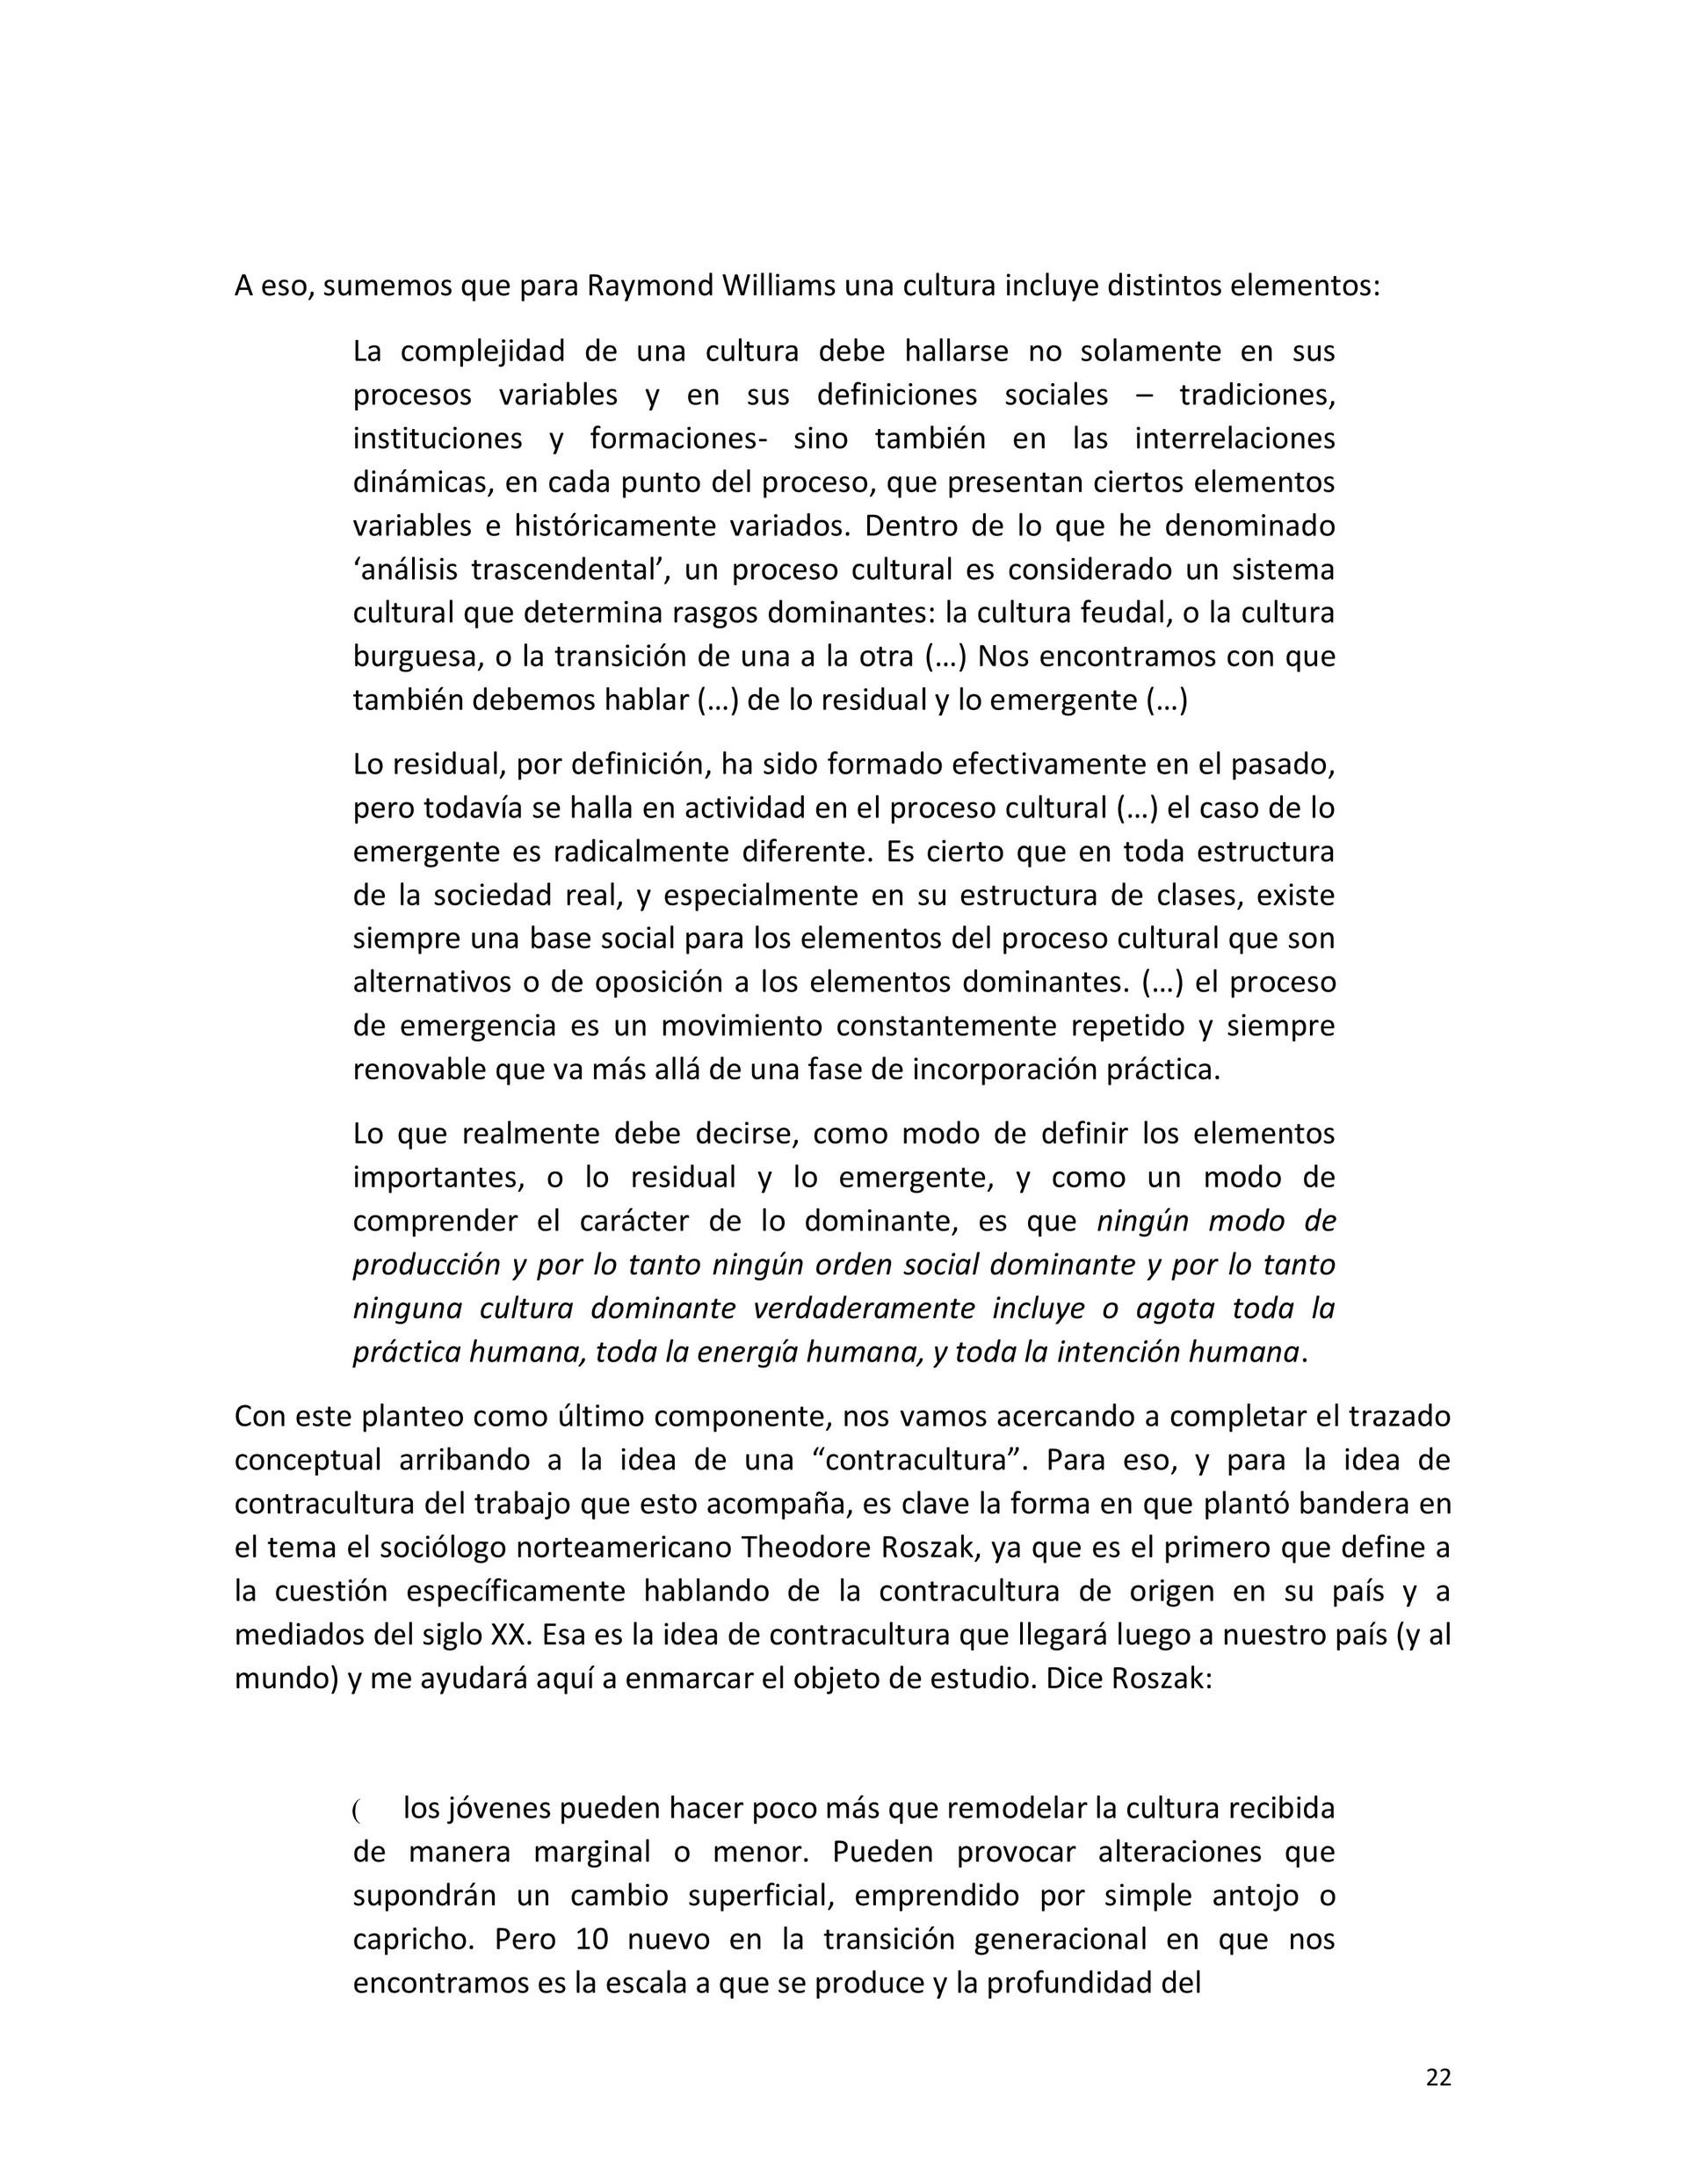 estacion_Page_21.jpeg